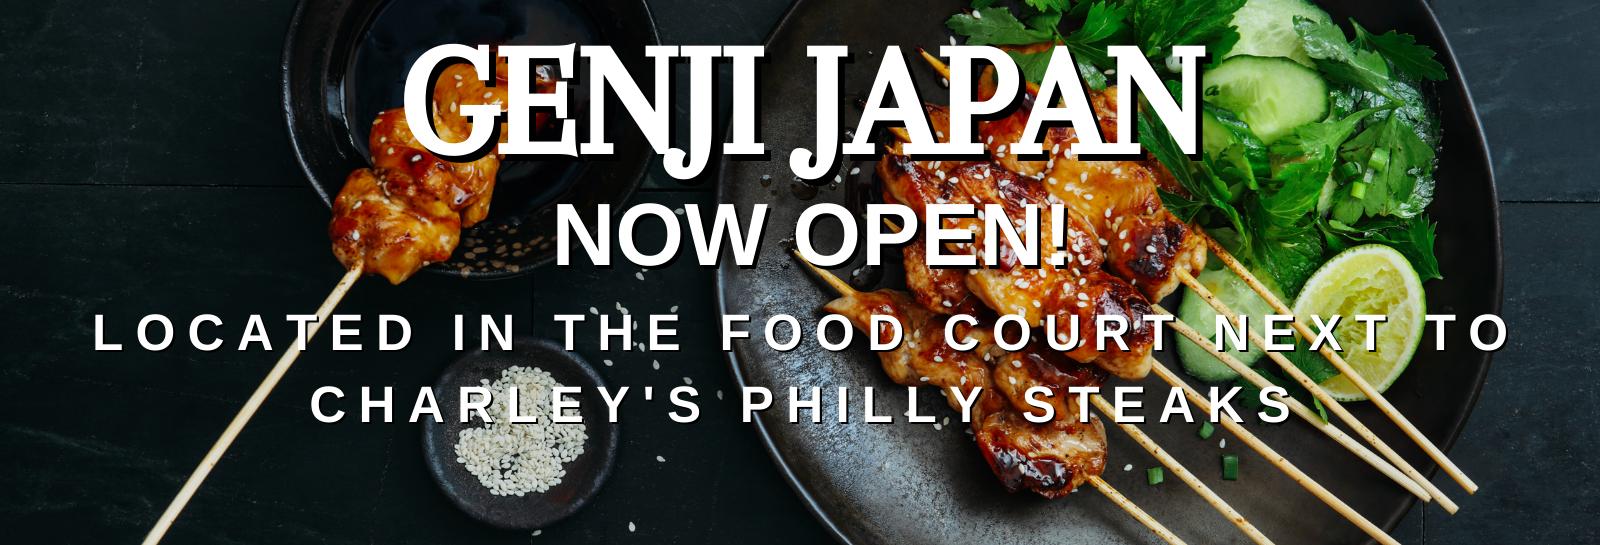 Genji Now Open